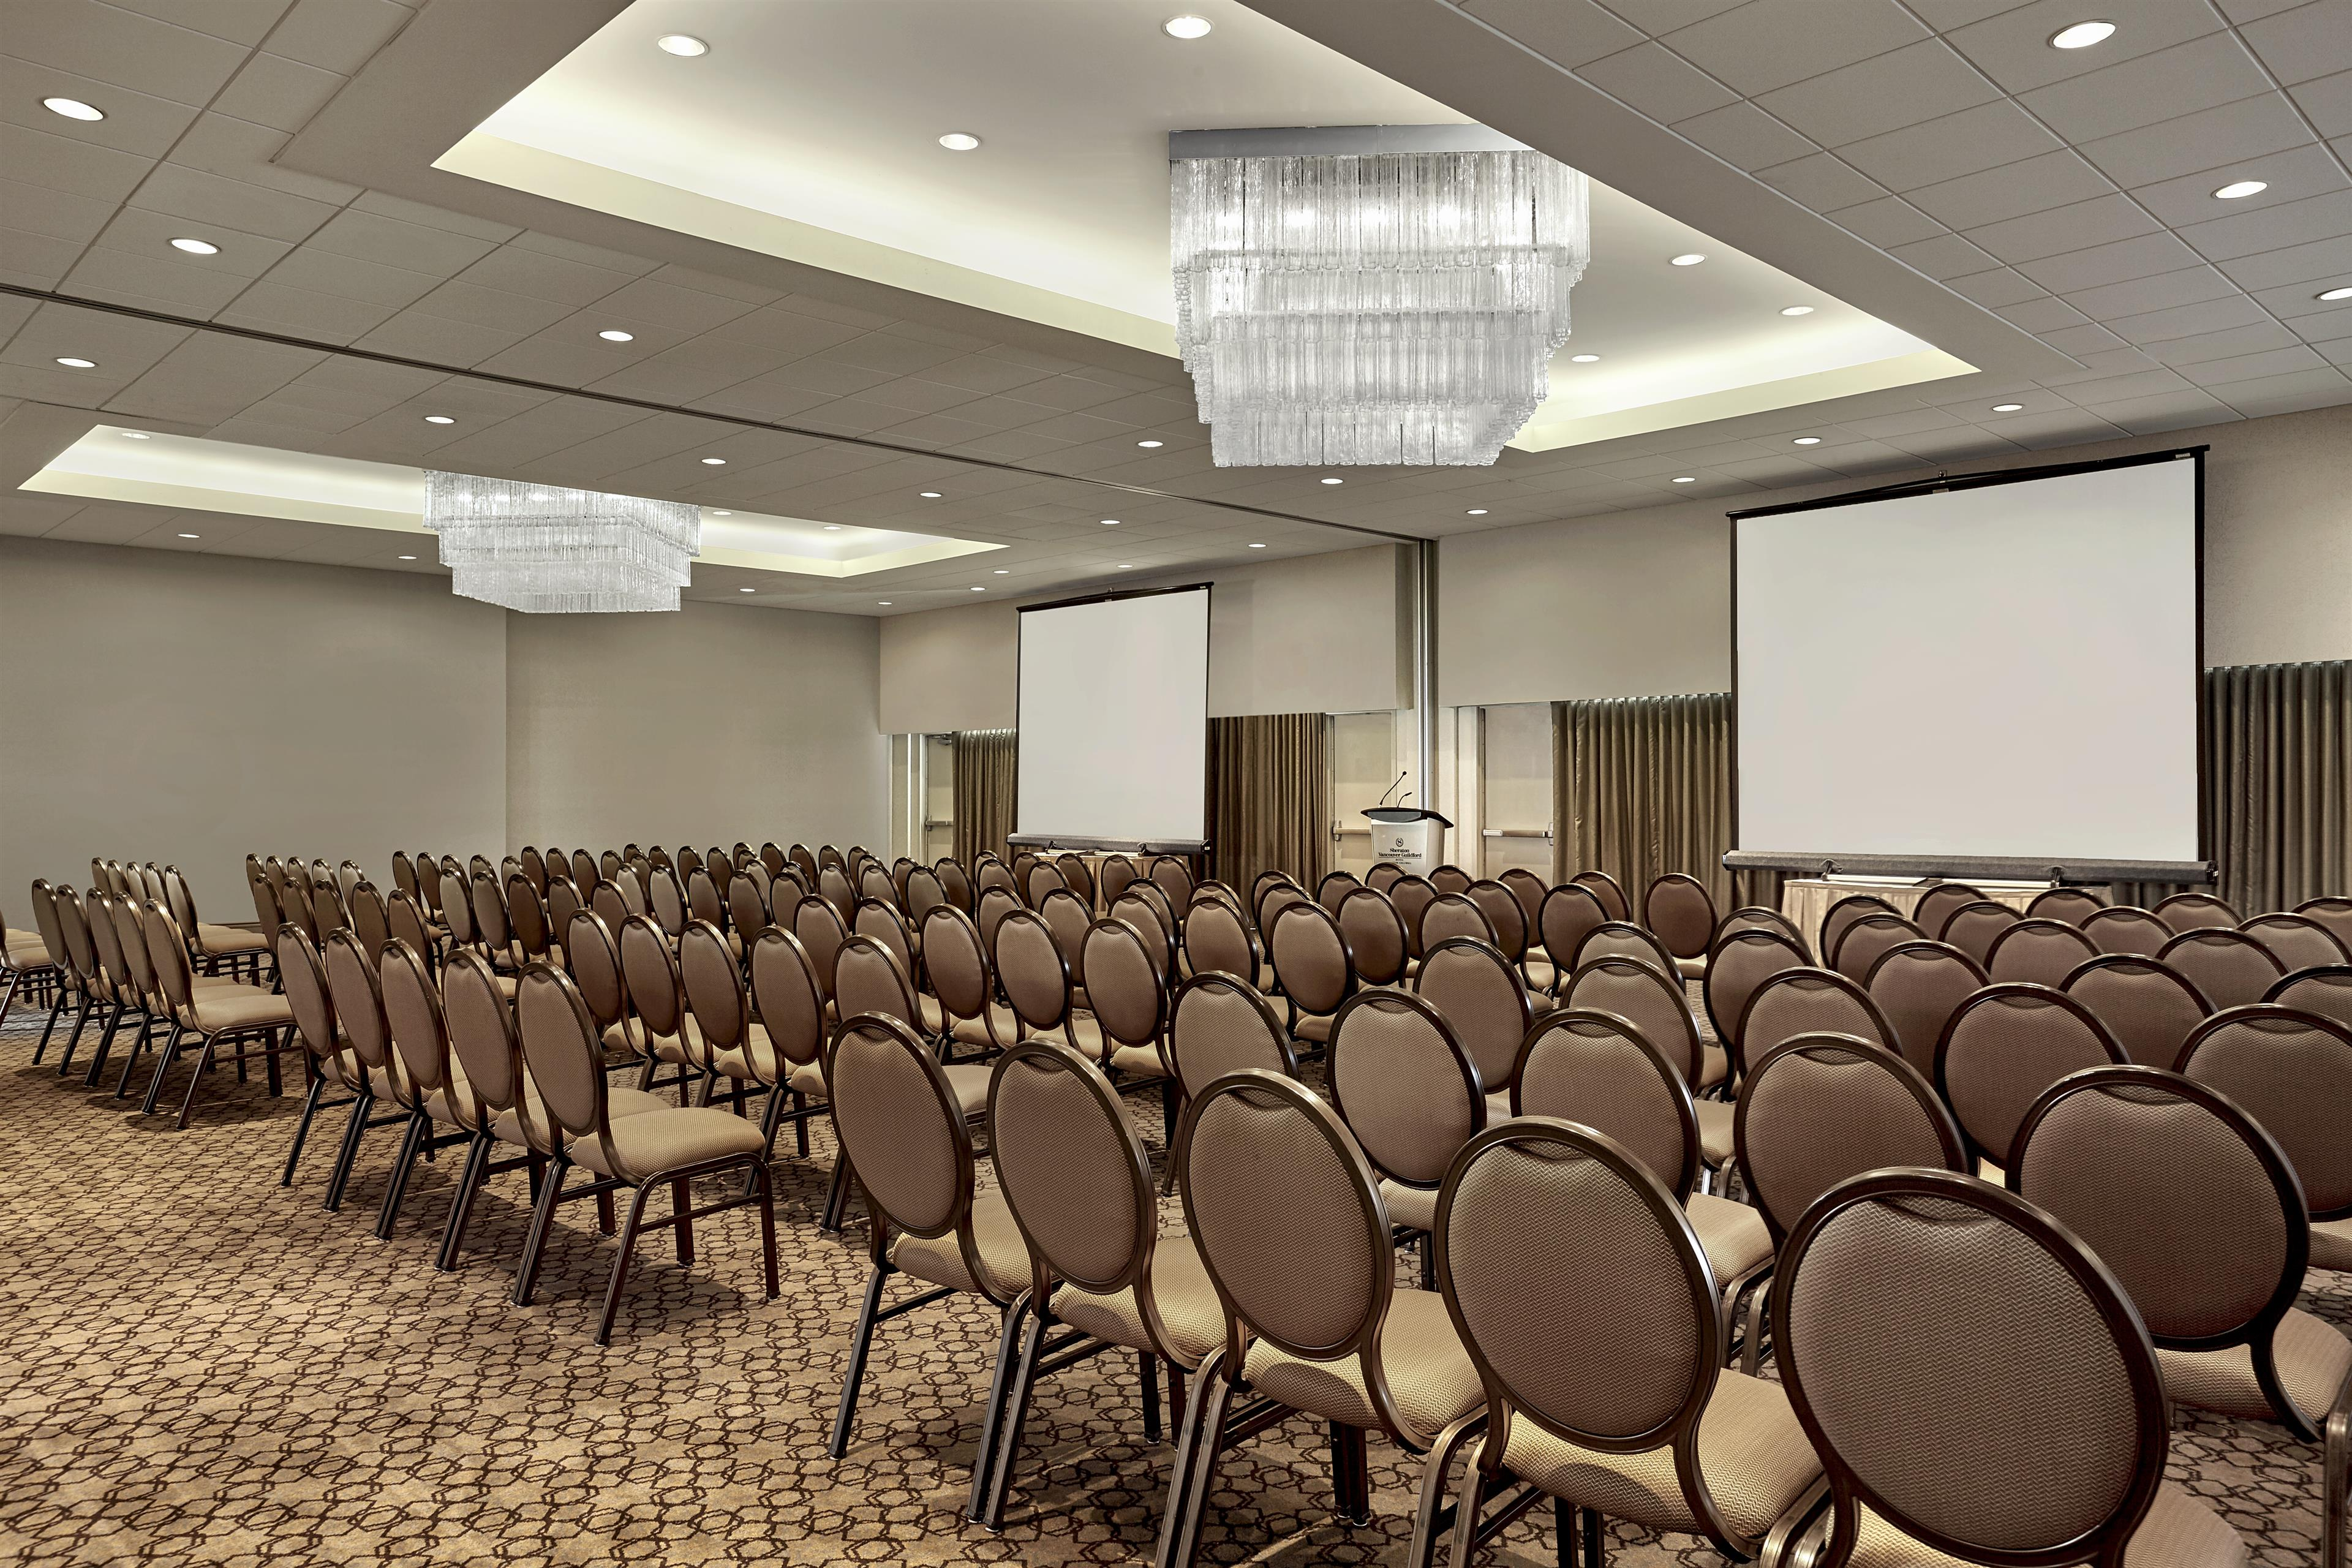 Sheraton Vancouver Guildford Hotel in Surrey: Tynehead Ballroom in Theatre Setup